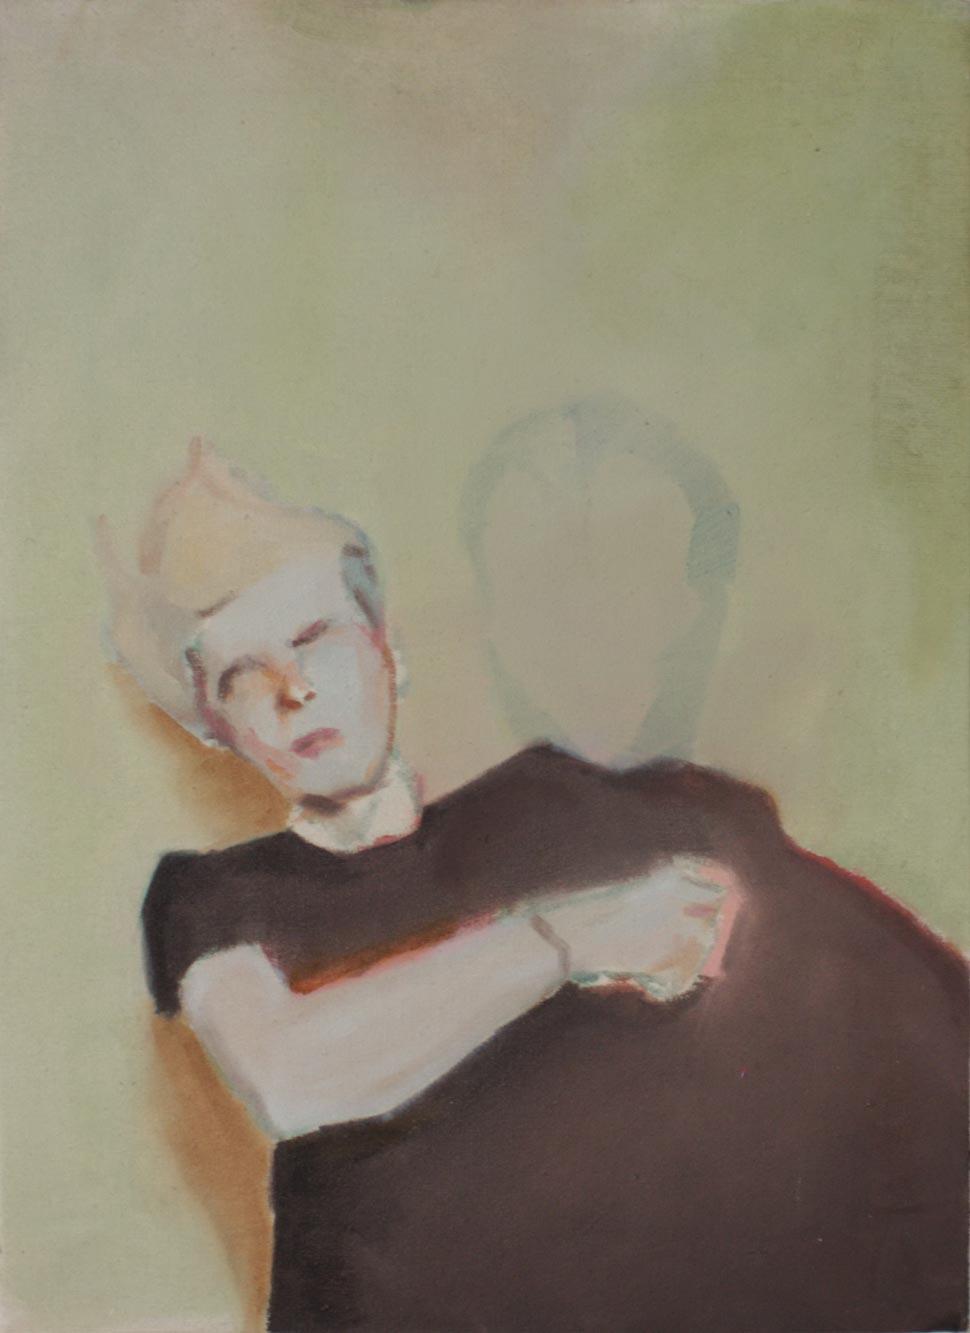 Derek Muehlgassner - save me (from loving you always)